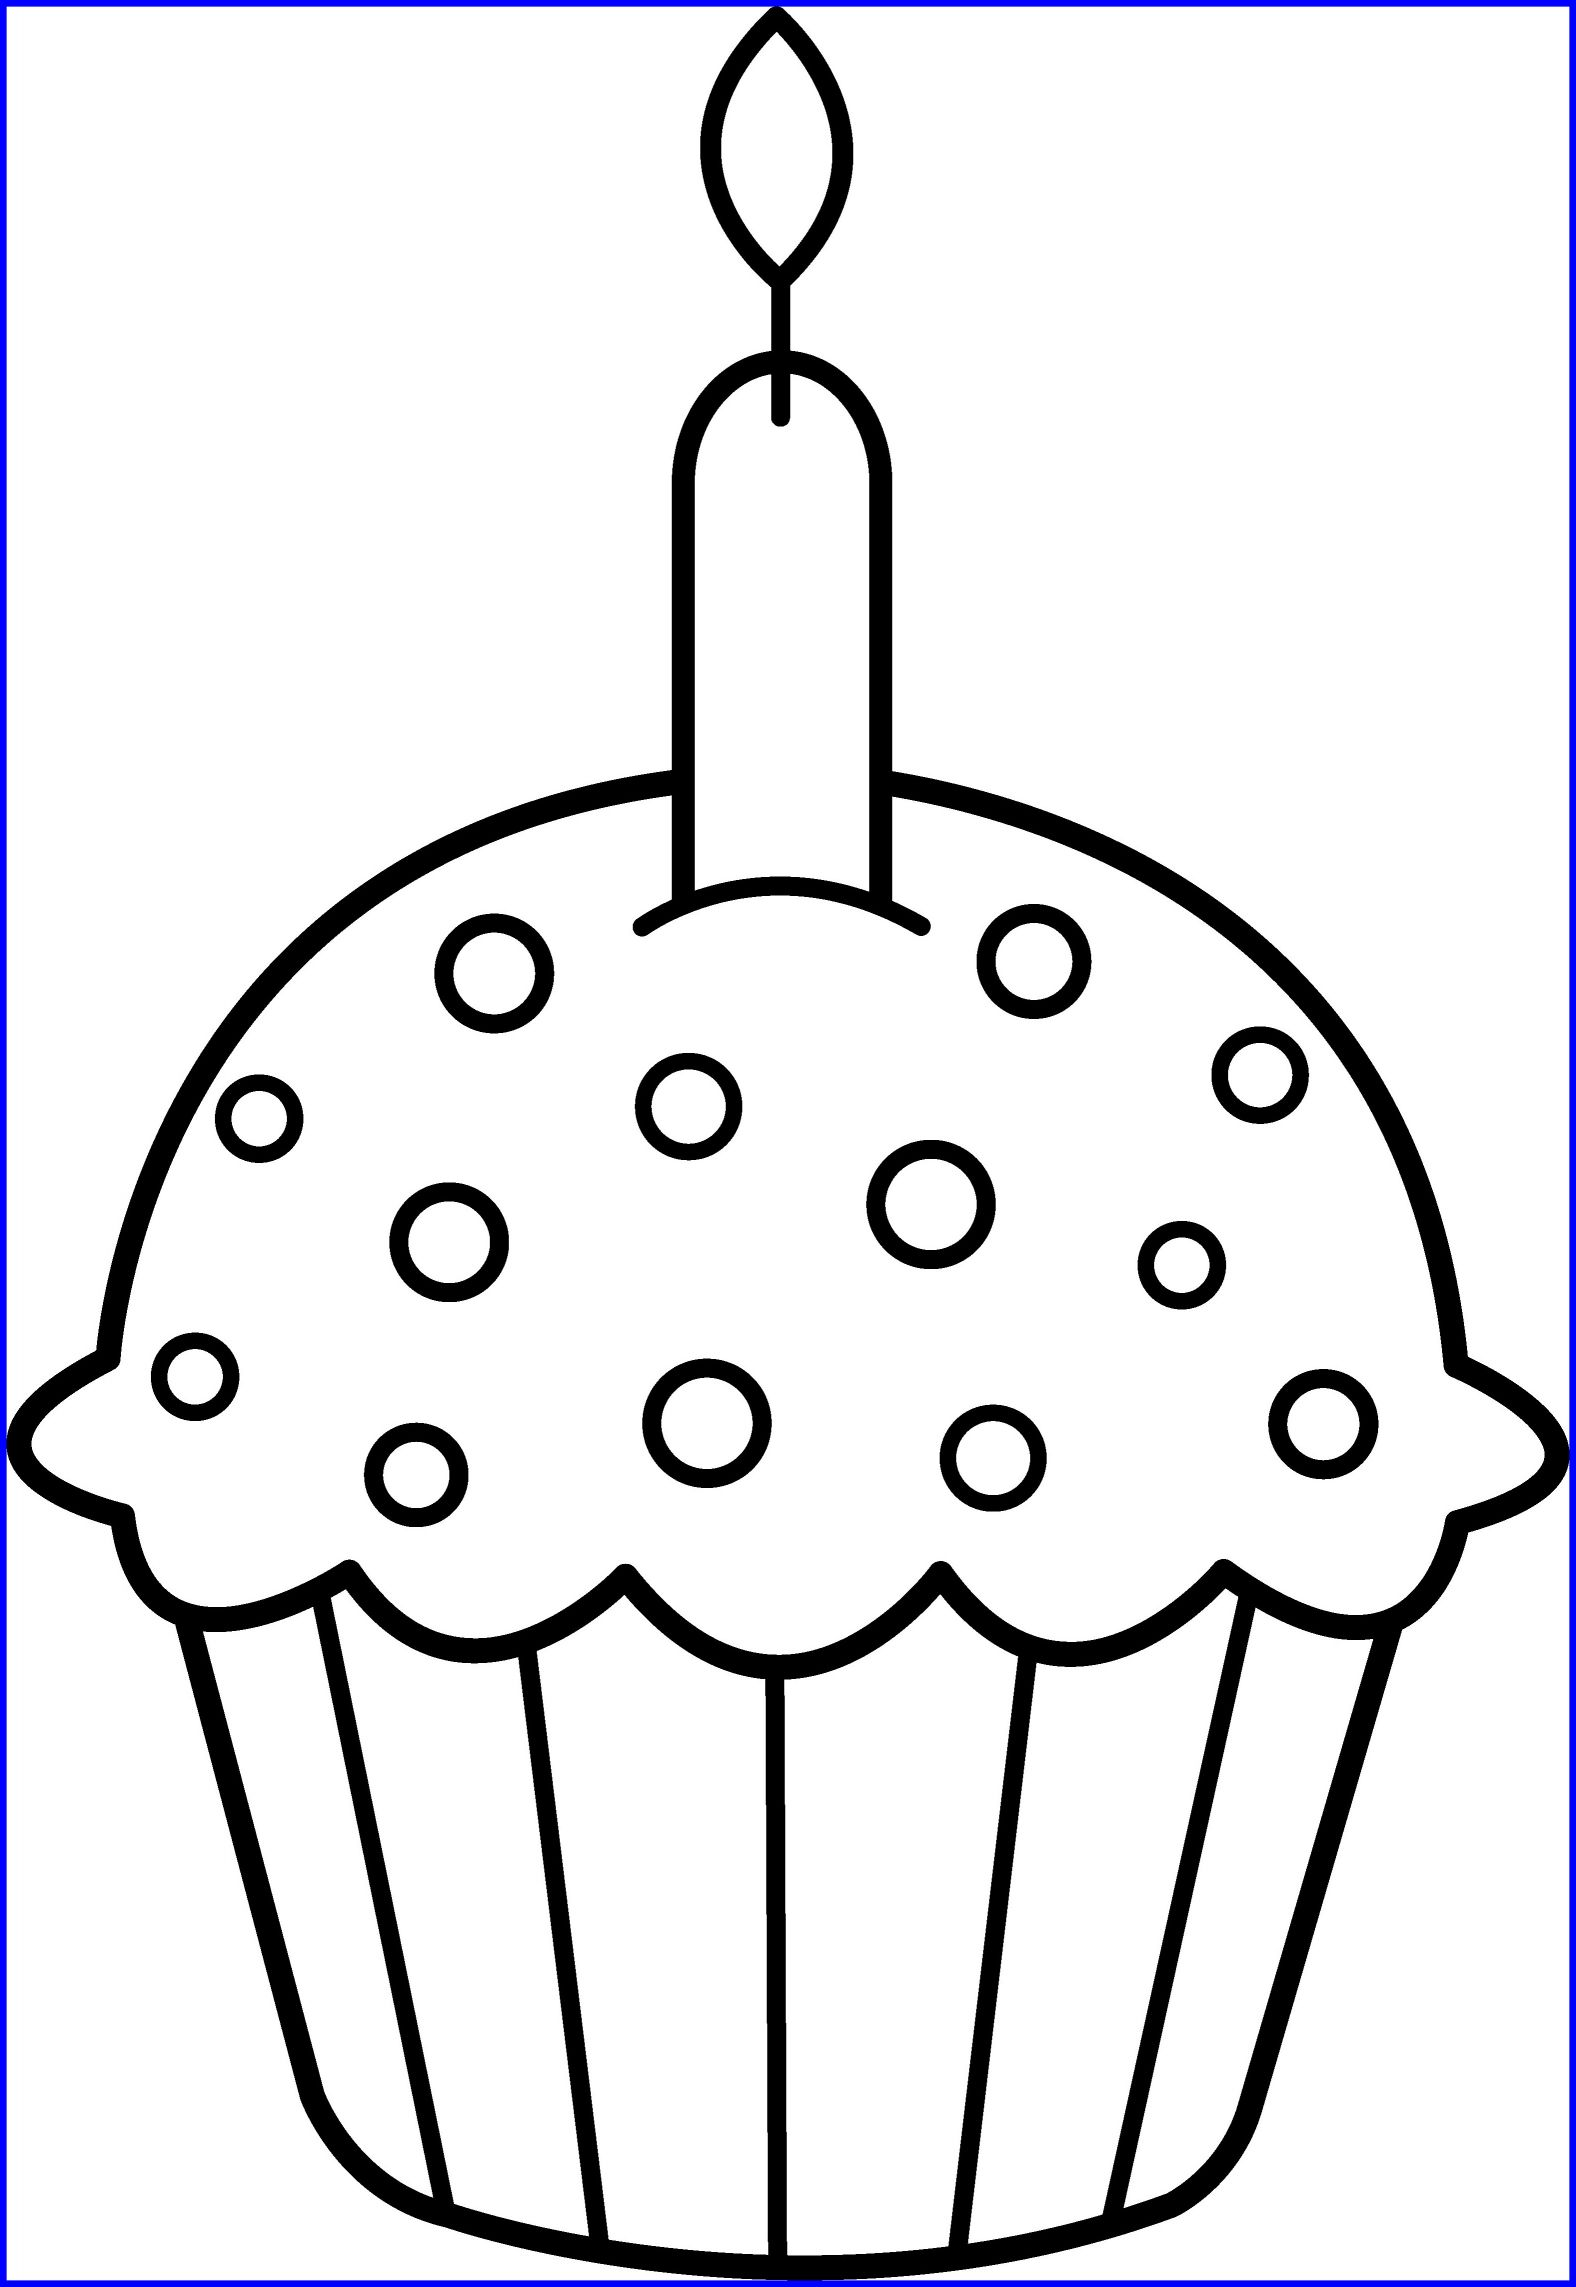 1576x2287 Incredible Printable Cupcake Coloring For Kids Cool Bkids